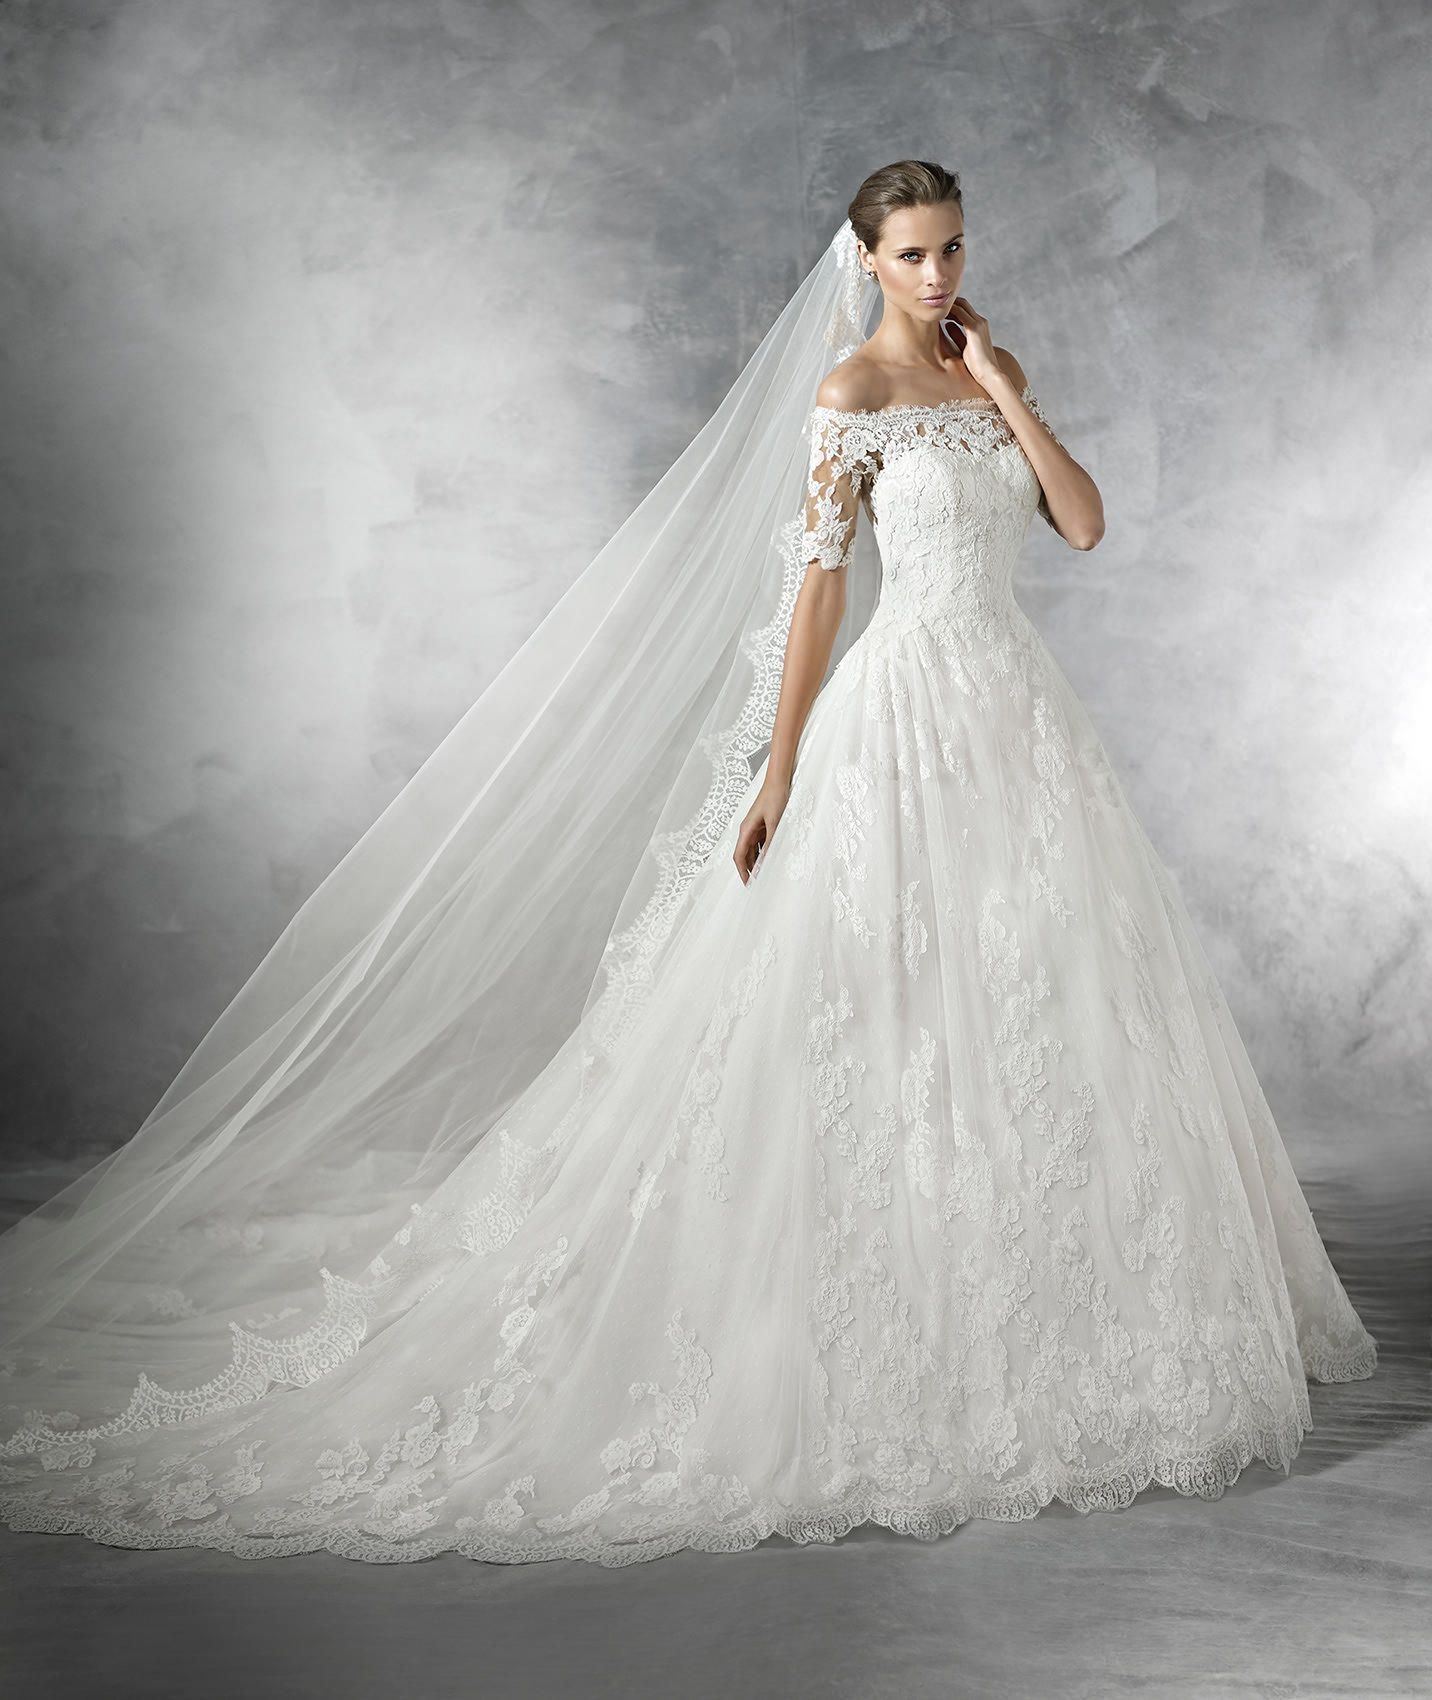 PLEASANT - Brautkleid aus Tüll im Prinzessin-Stil | Pronovias ...